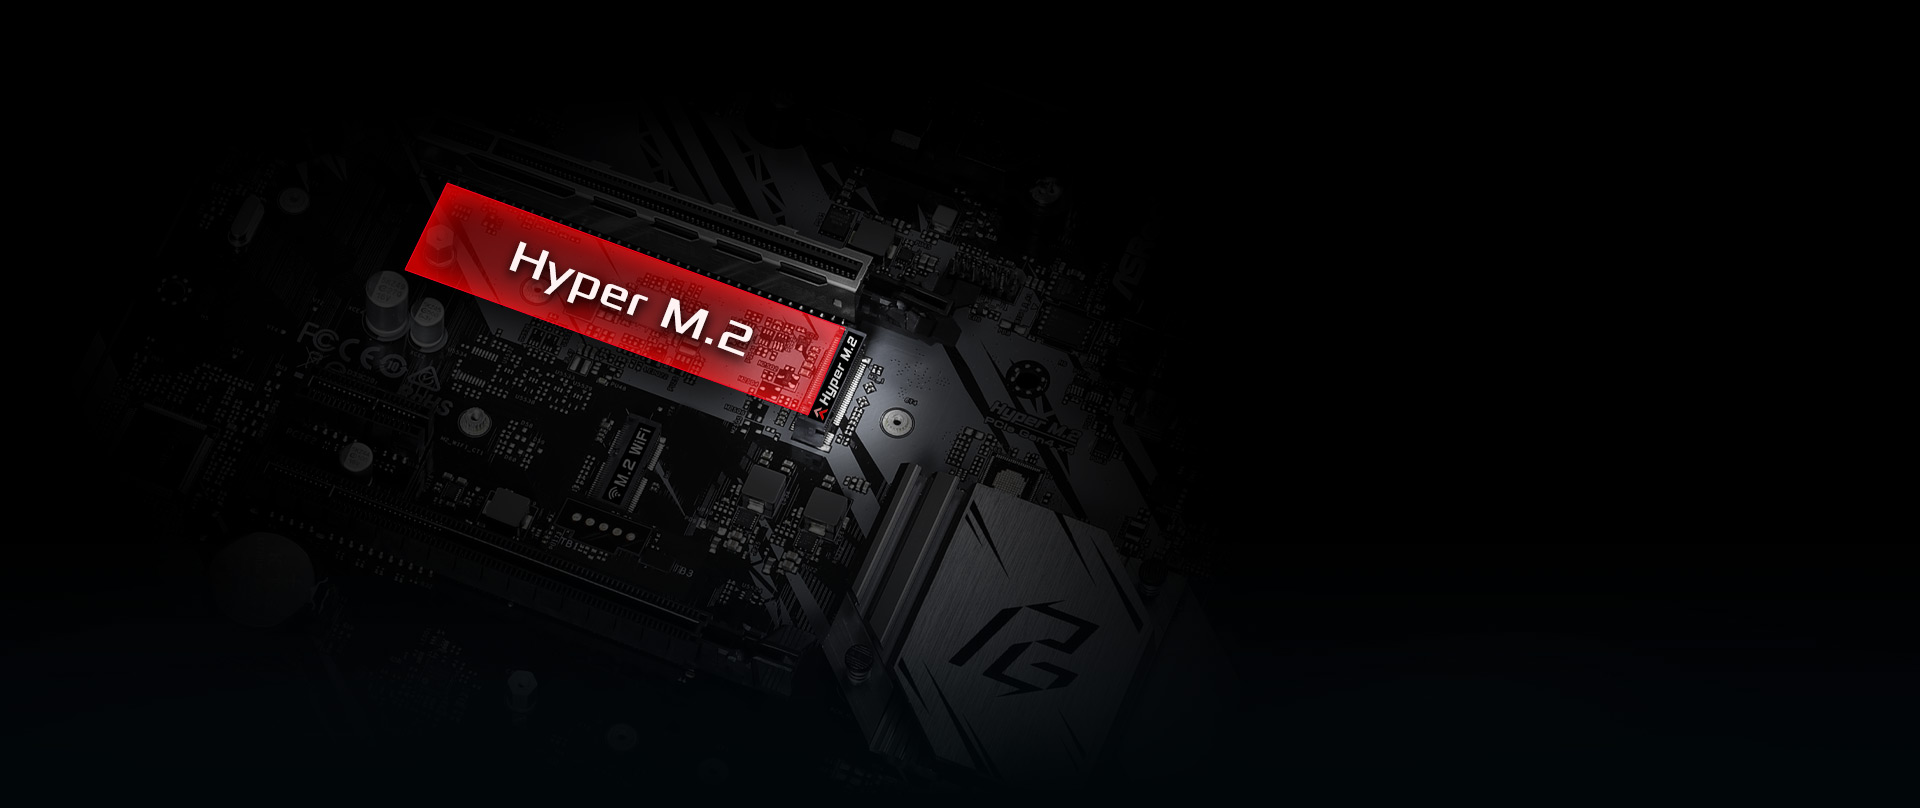 B550 Phantom Gaming 4ac motherboard